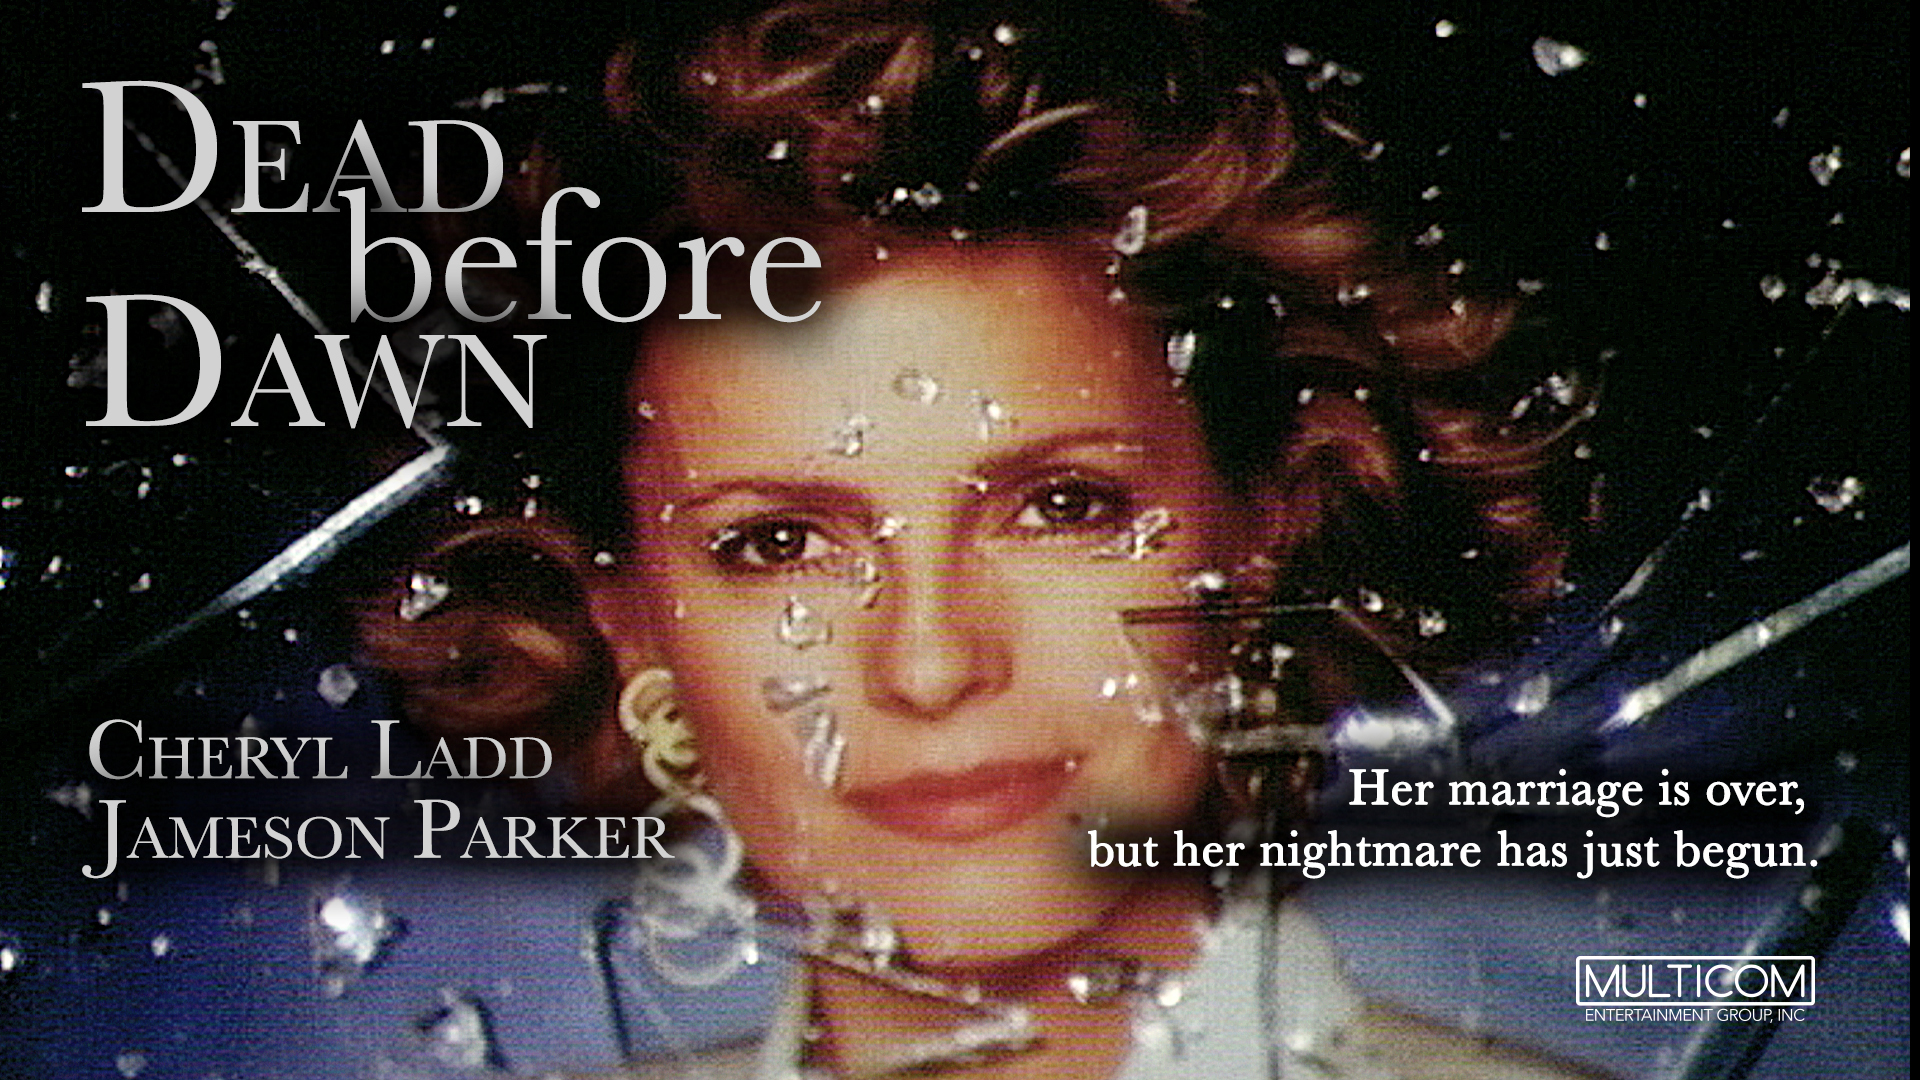 Dead Before Dawn (Restored)